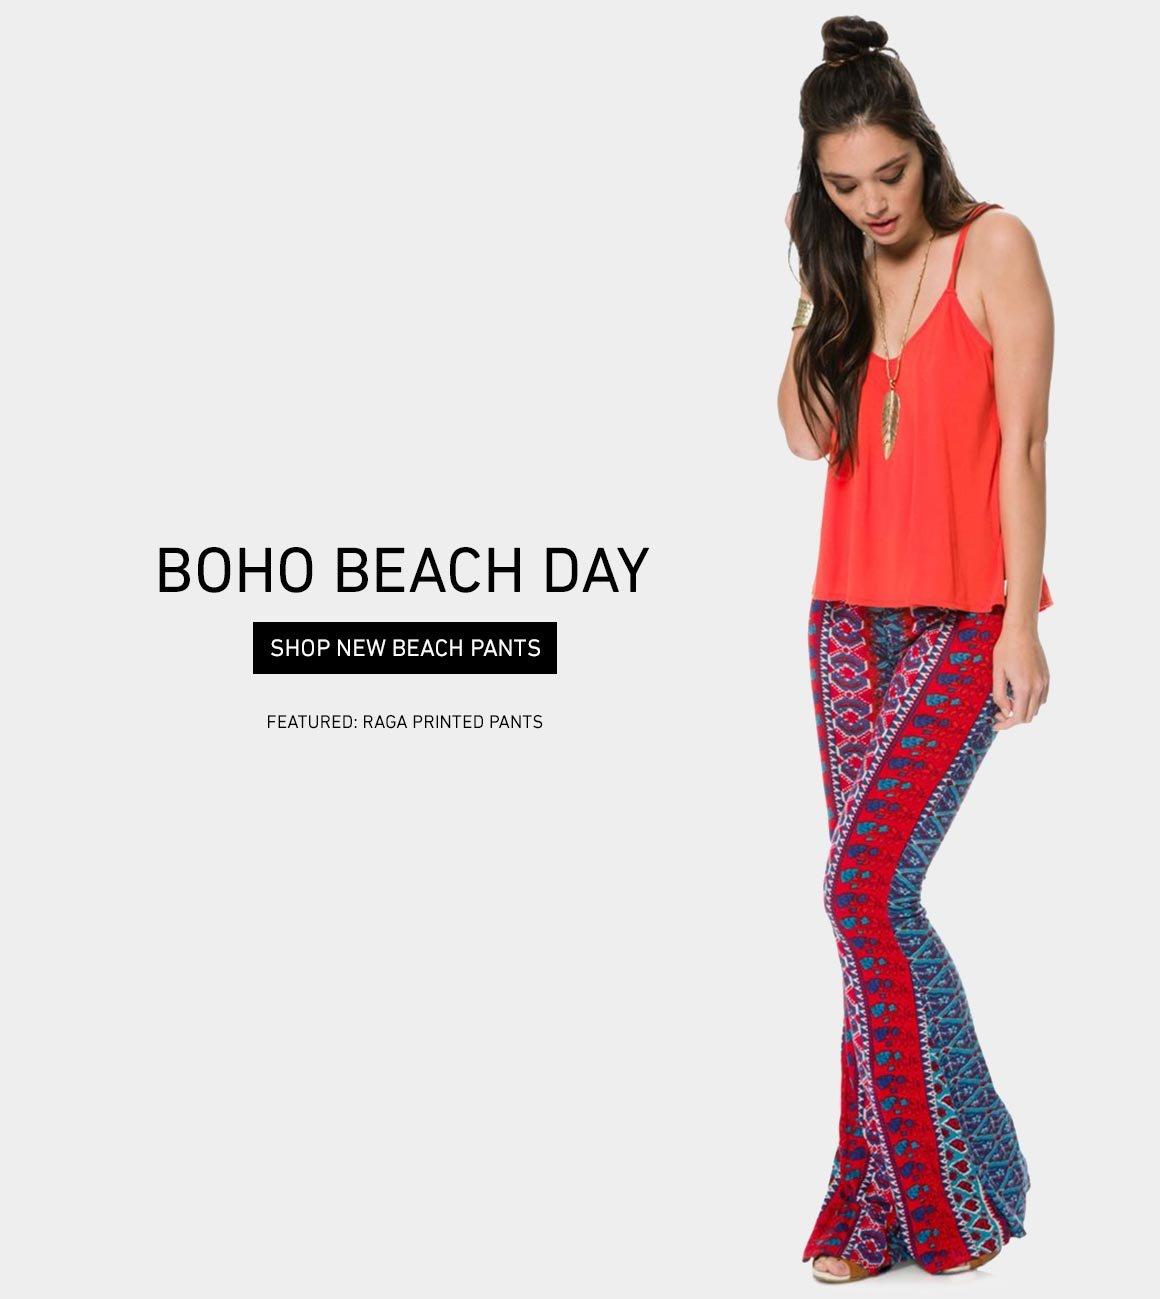 Boho Beach Day: Shop New Beach Pants